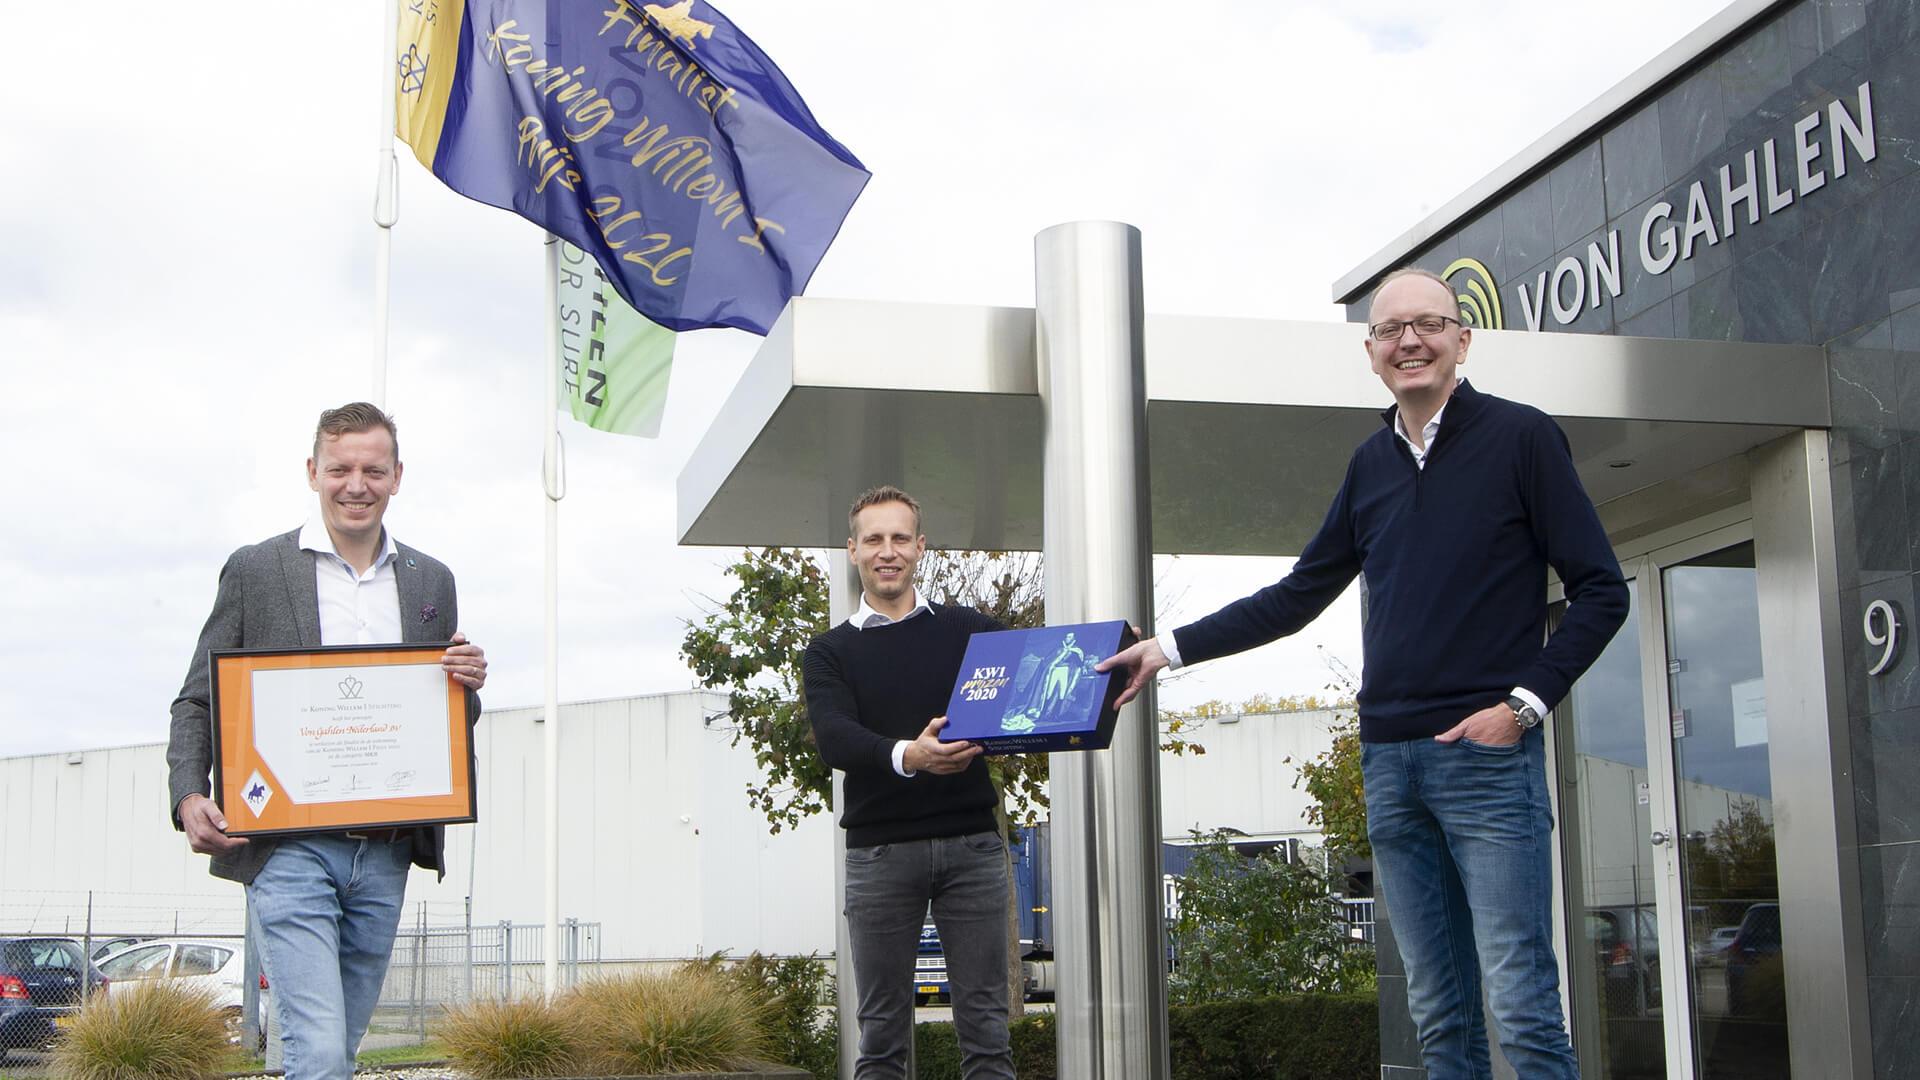 Von Gahlen is nominated for the Koning Willem I Award